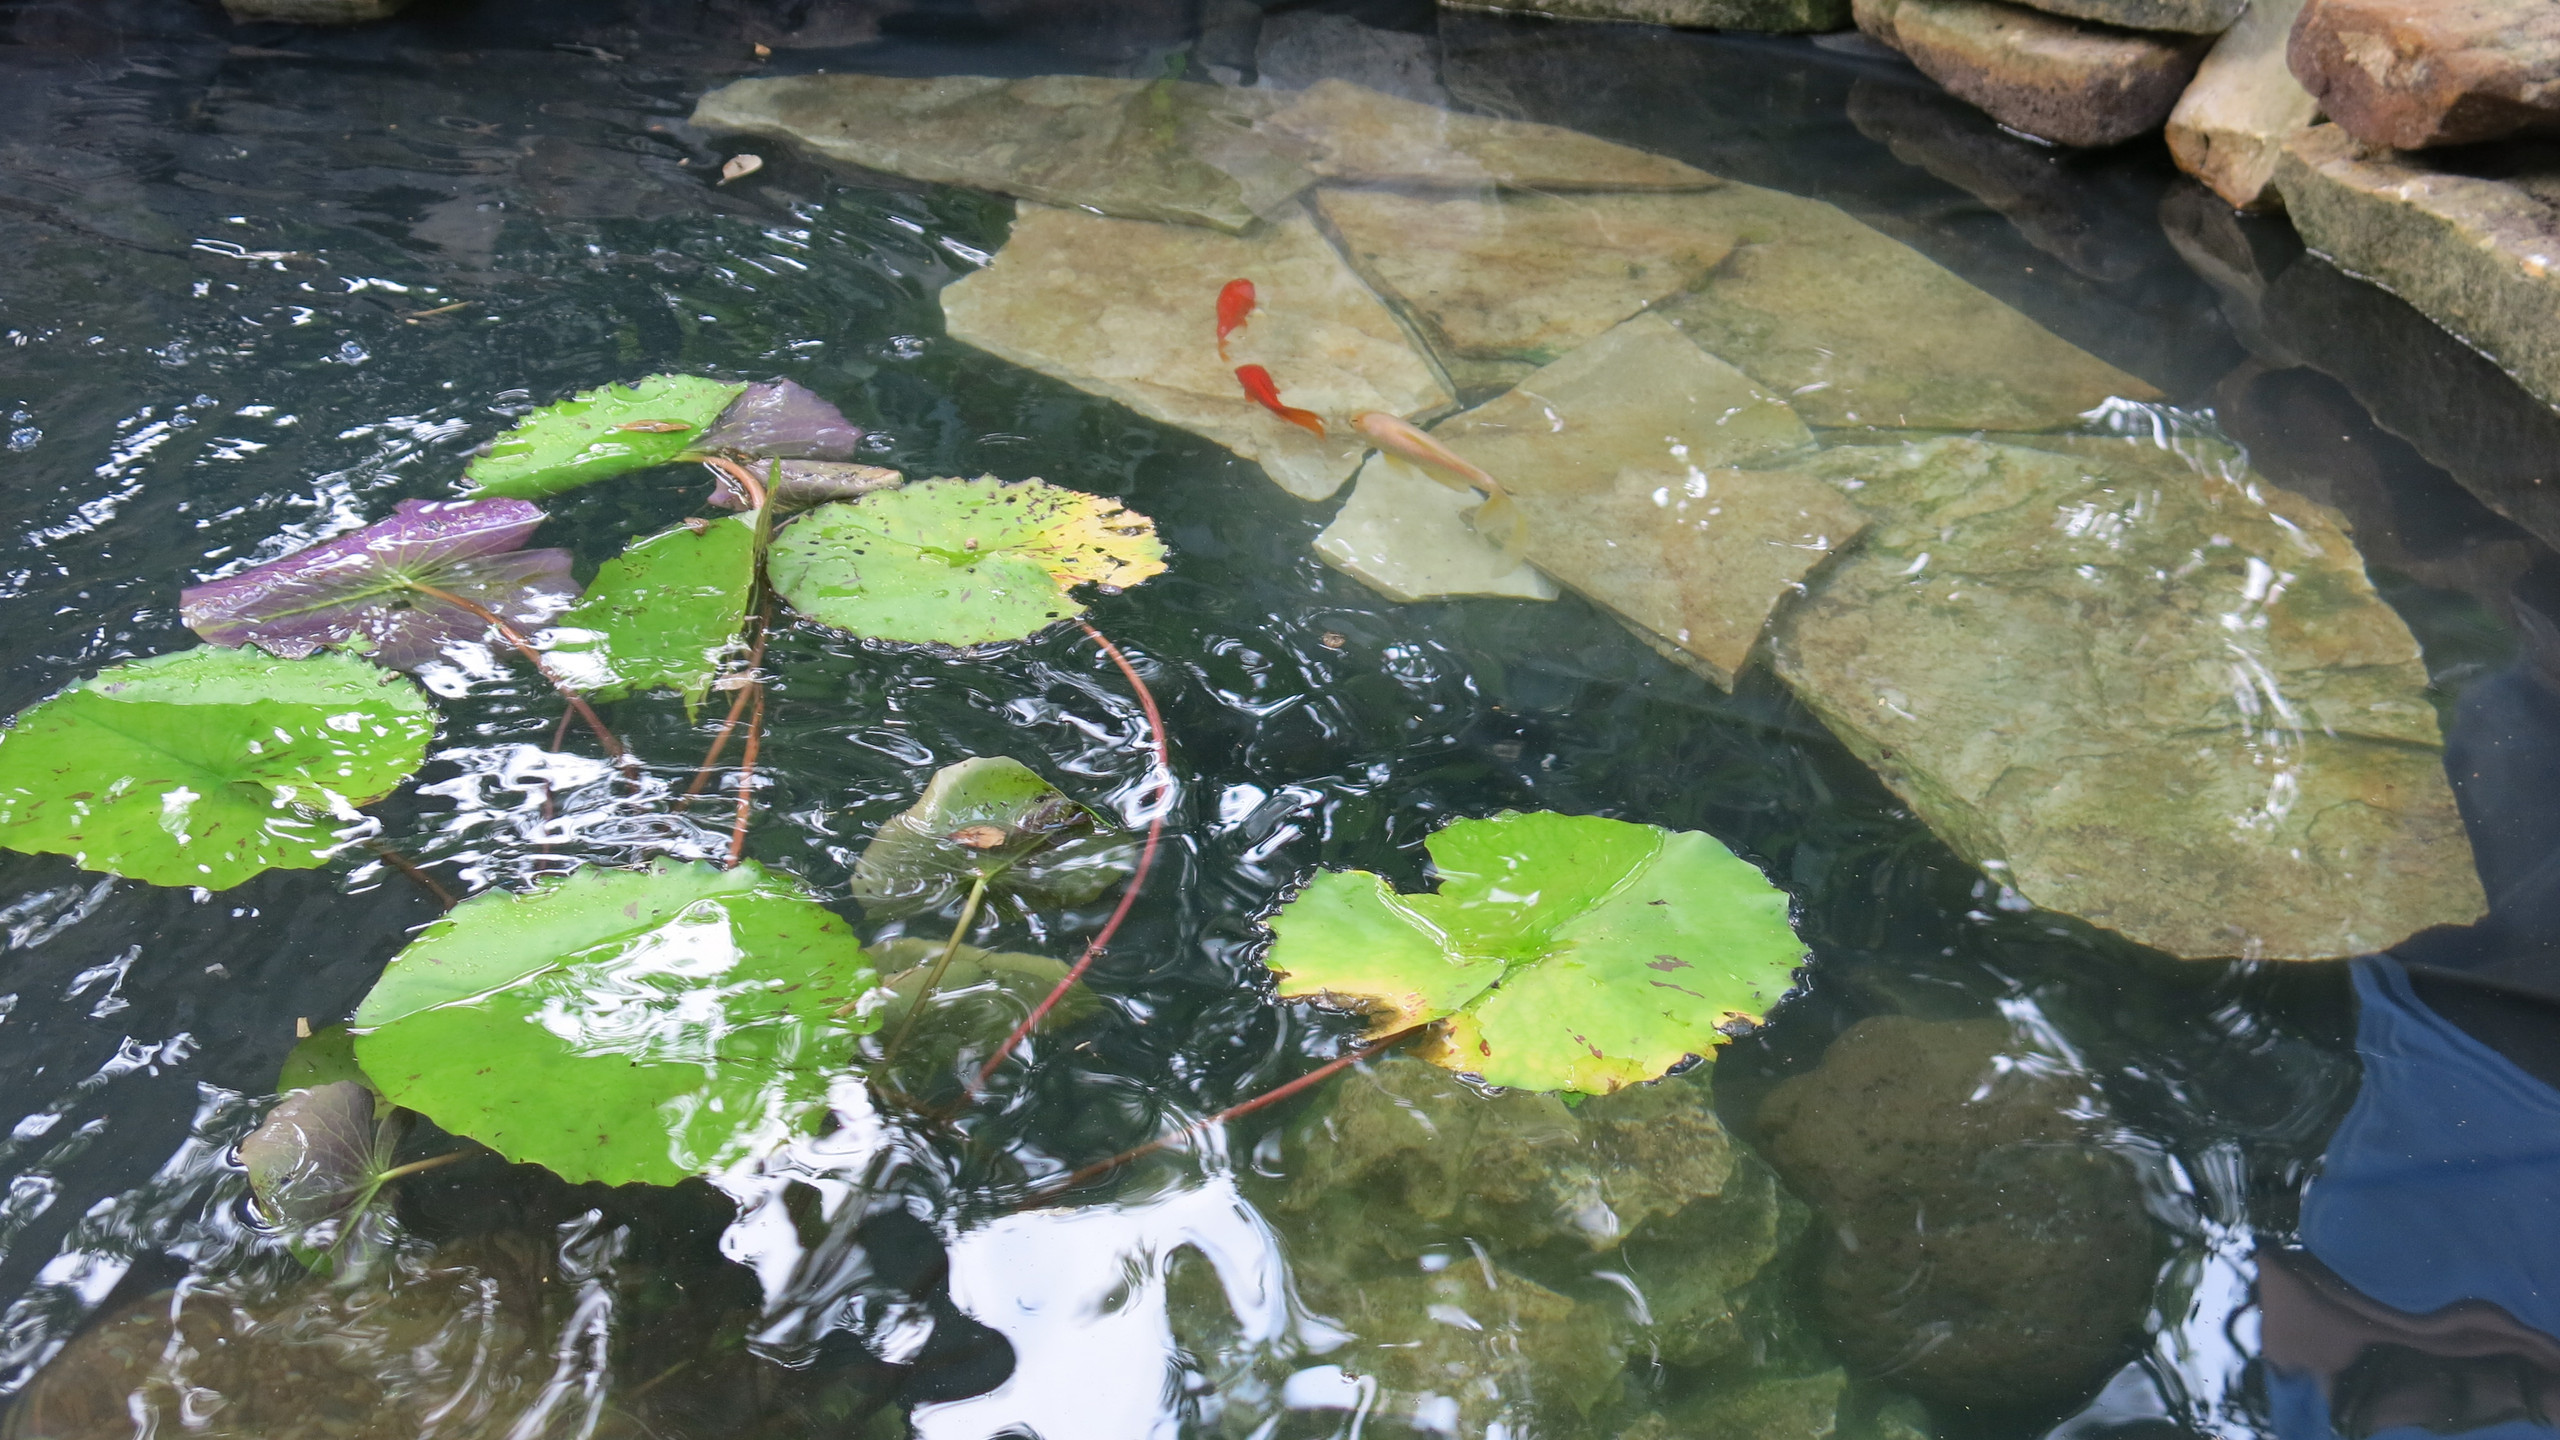 34-Water Fills Over Interior Shelf as GoldFish Swim